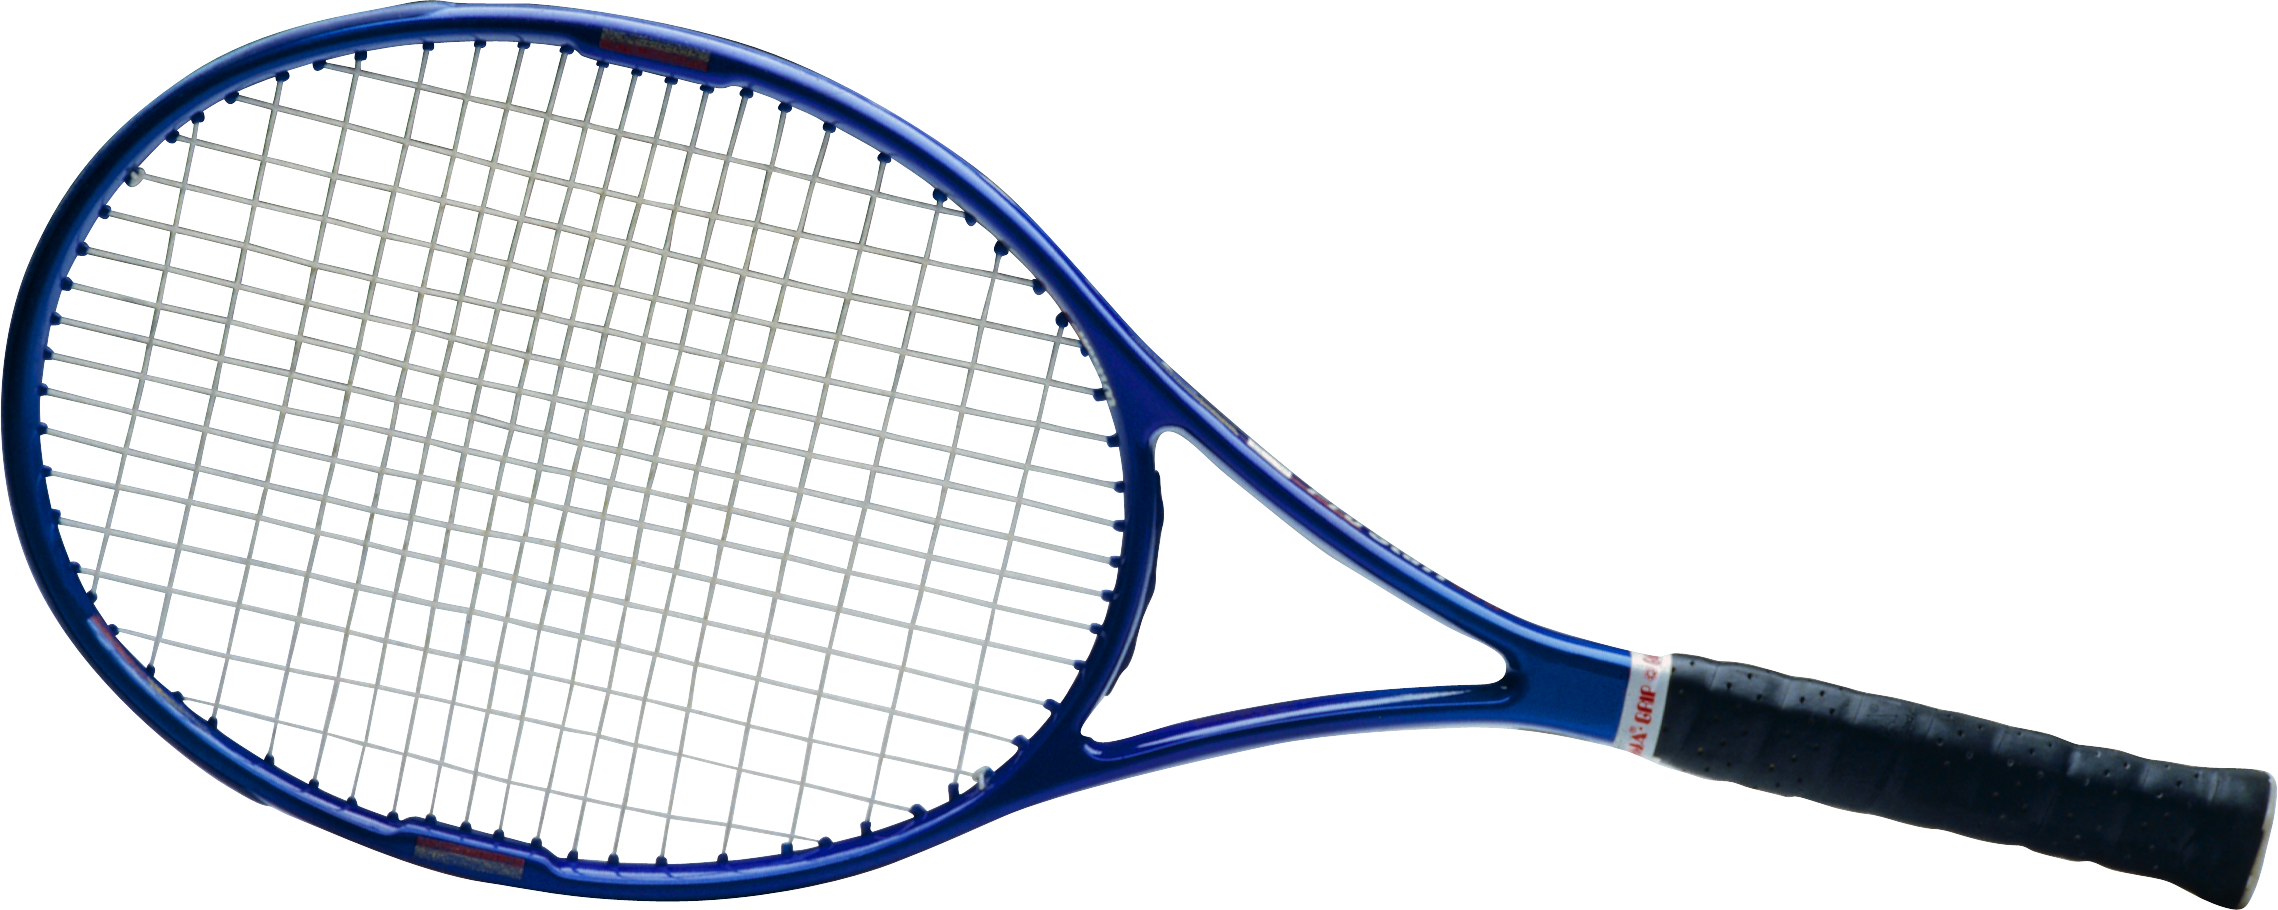 Baseball bat and tennis racket clipart jpg transparent Tennis Racket PNG Image - PurePNG | Free transparent CC0 PNG Image ... jpg transparent